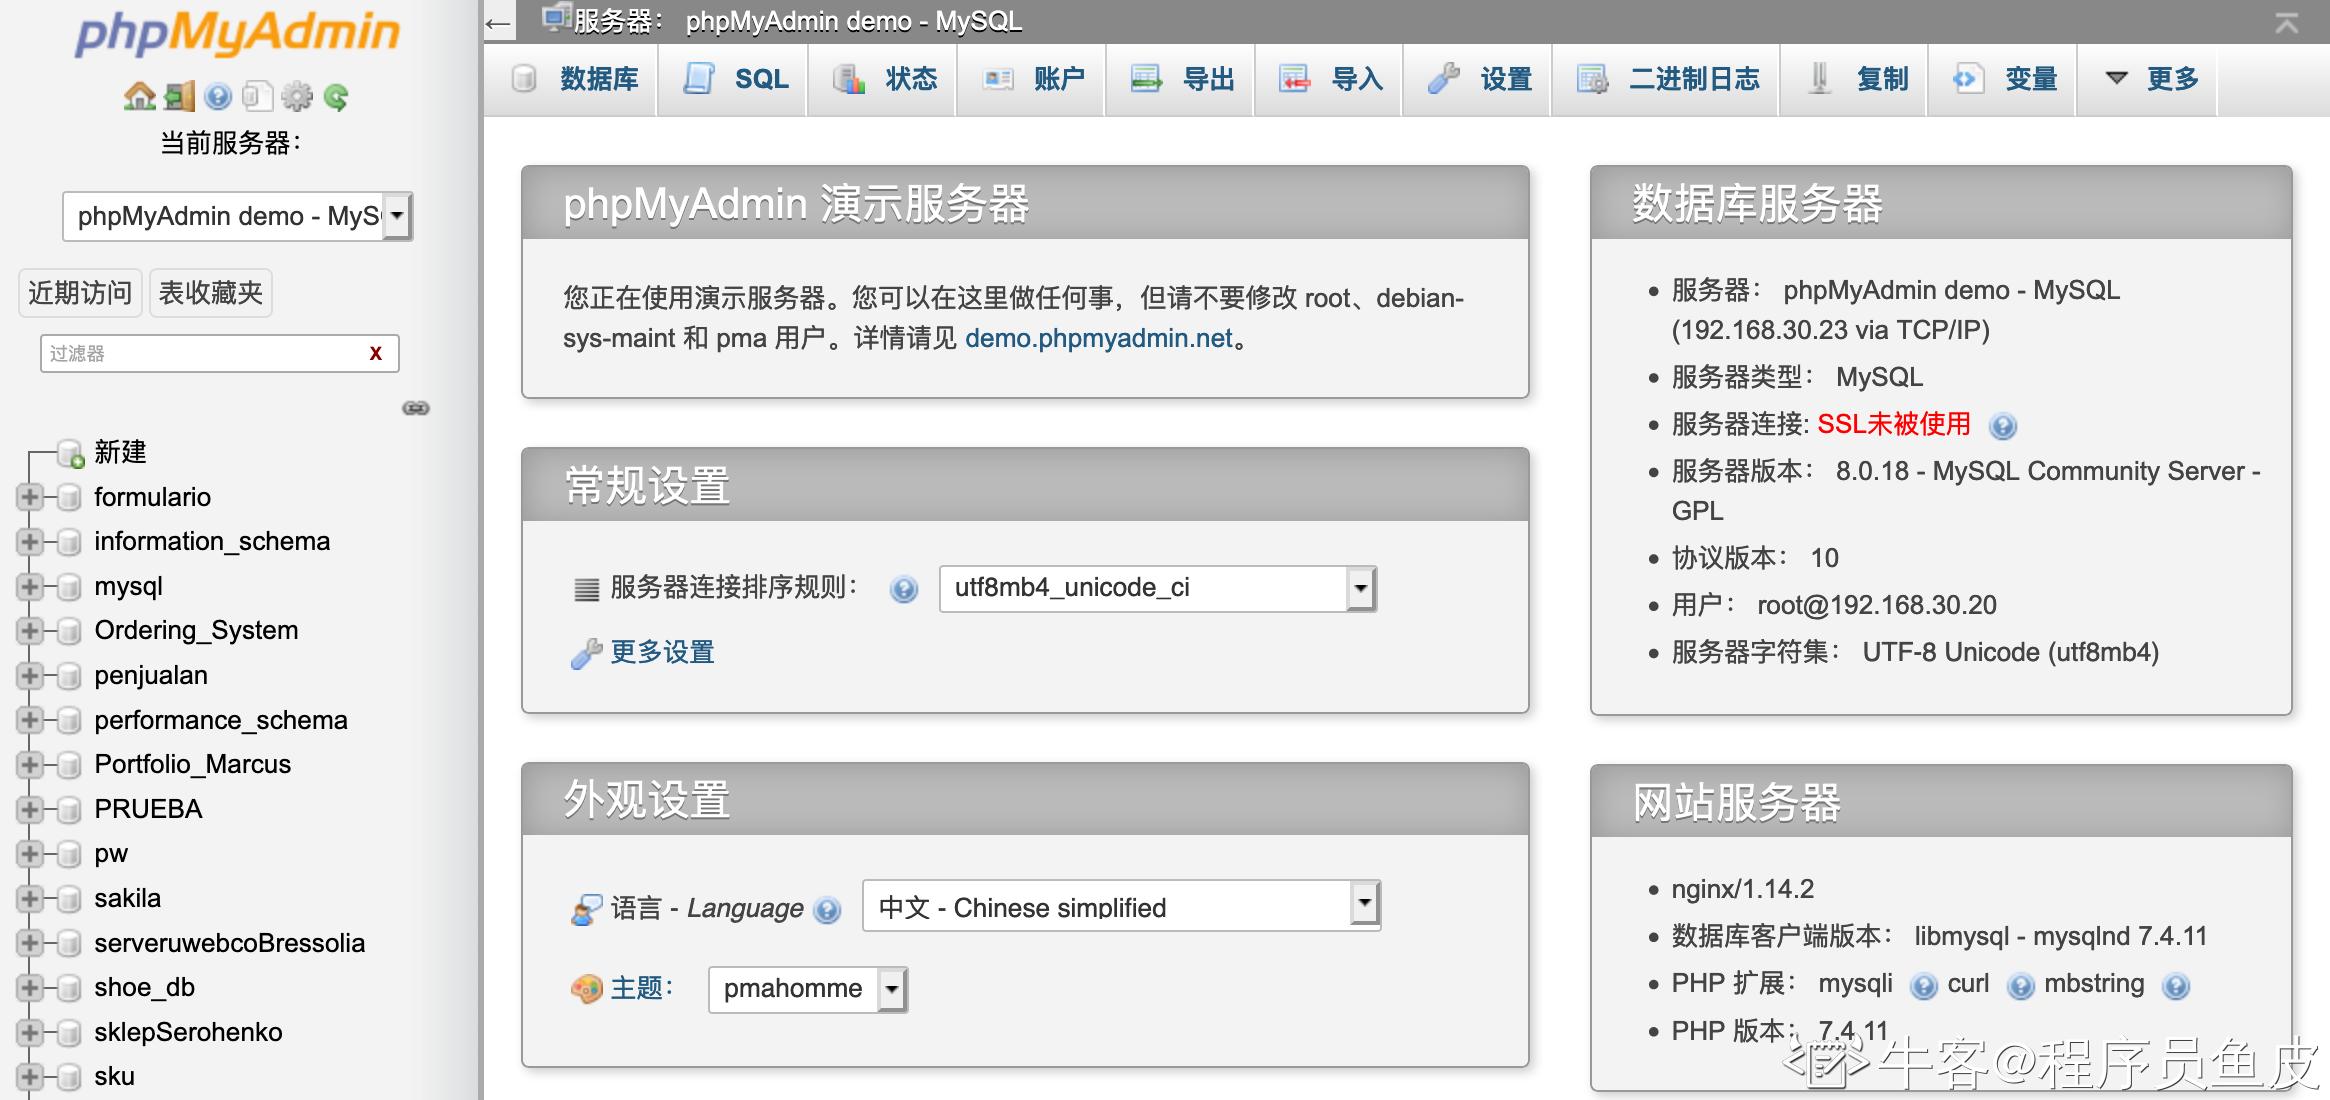 phpMyAdmin 数据库管理